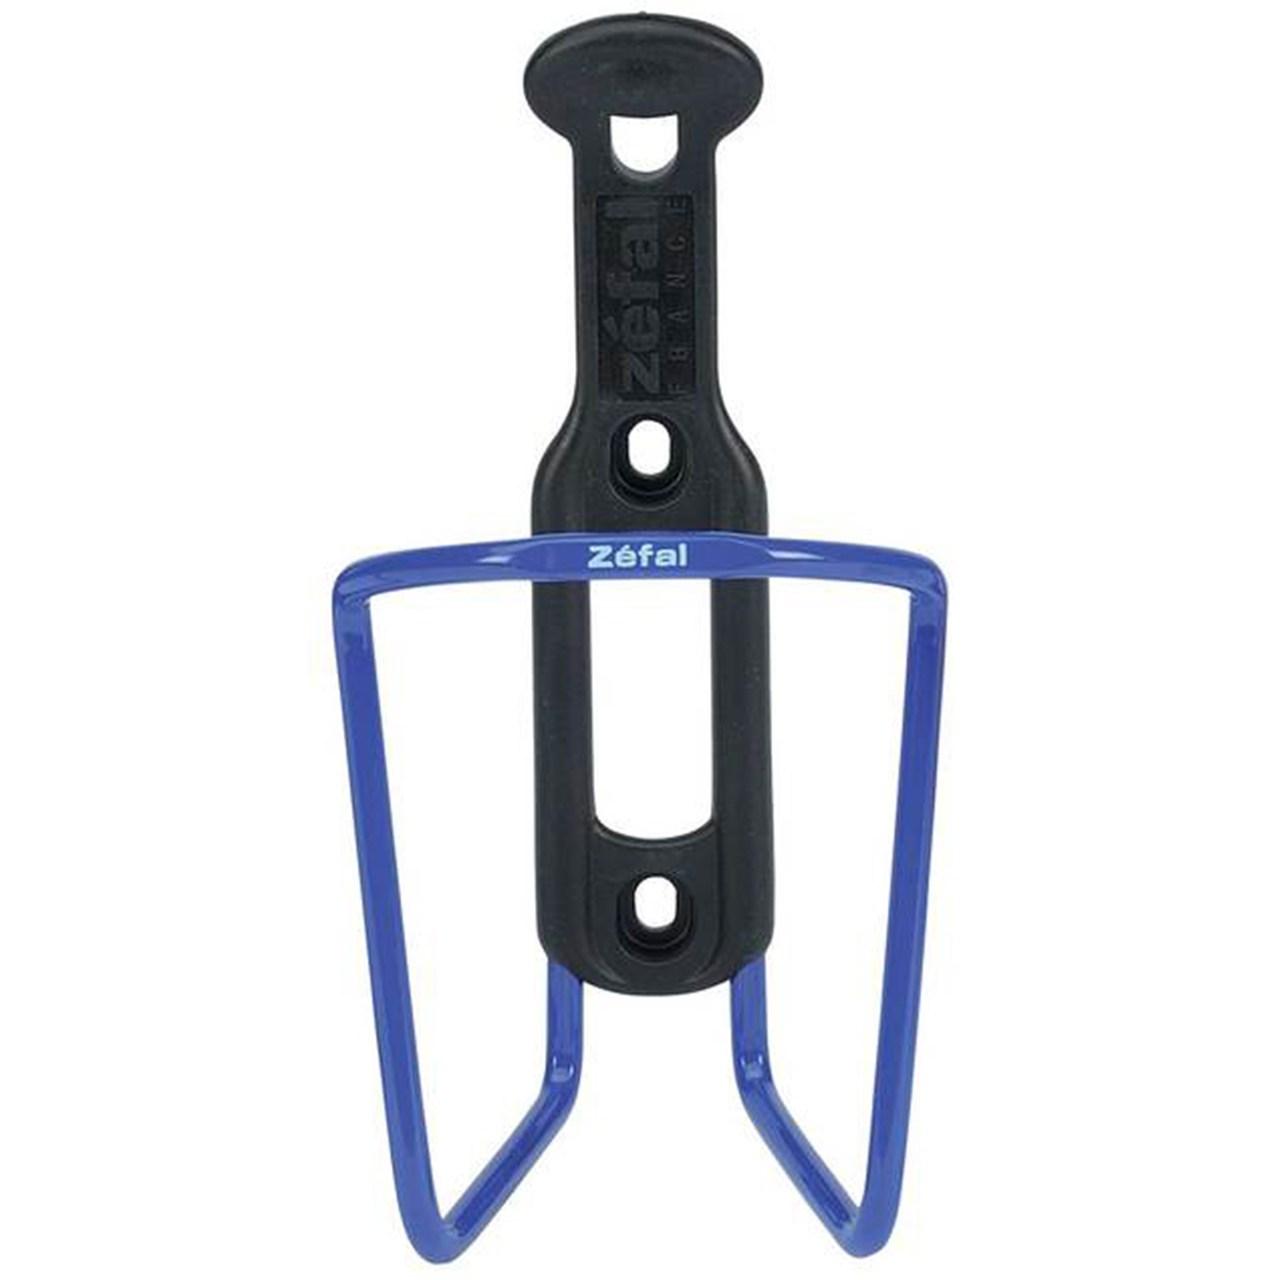 بست قمقمه دوچرخه زفال مدل Zefal Alu Plast Bottle Cage